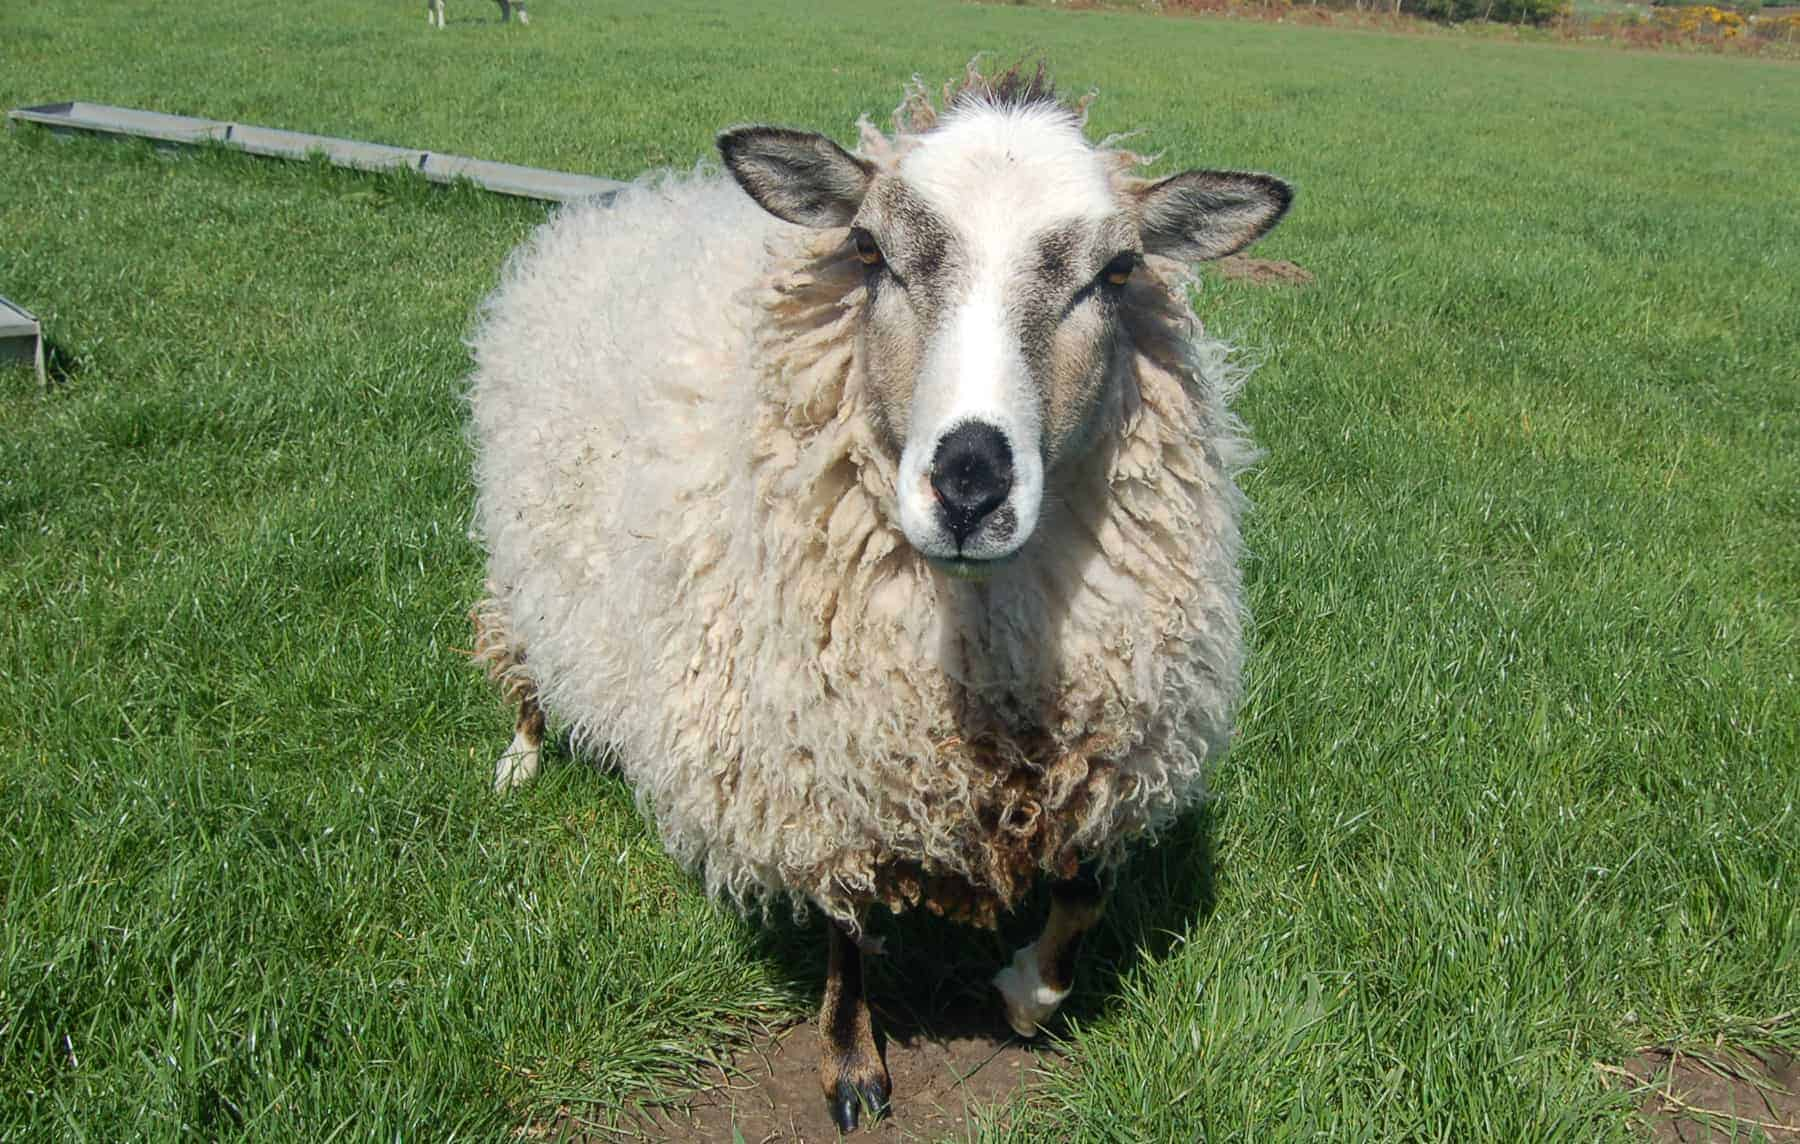 patchwork sheep yearling beautiful smudge cute lamb golden soay cross shetland jacob sheep